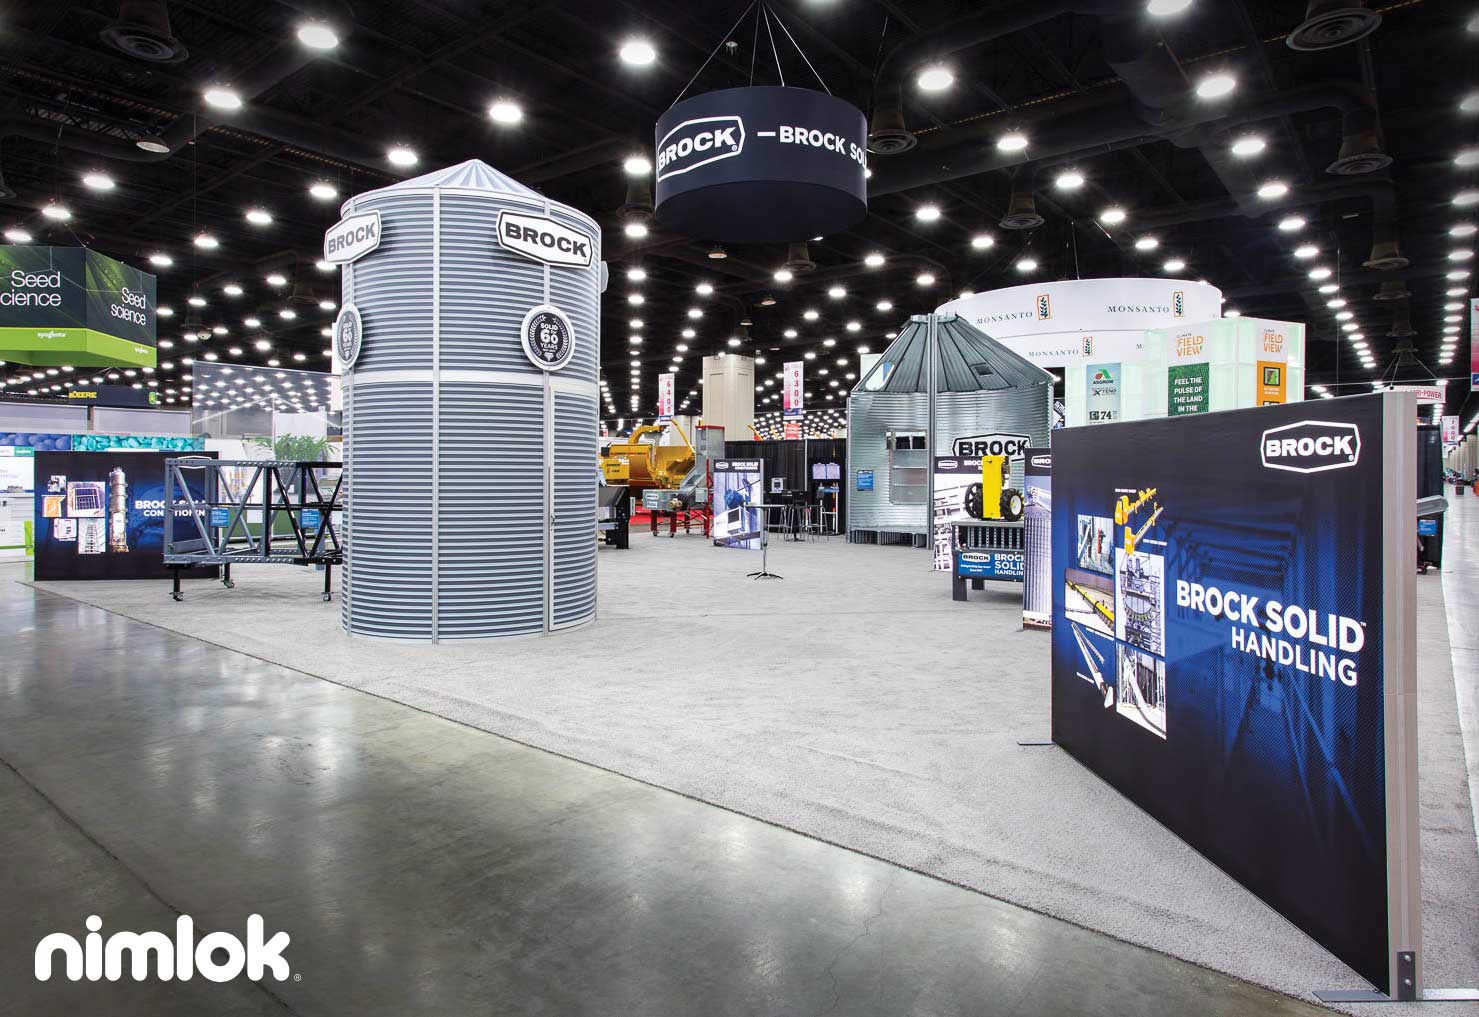 Top 10 Creative Trade Show Booth Design Examples | Nimlok Blog